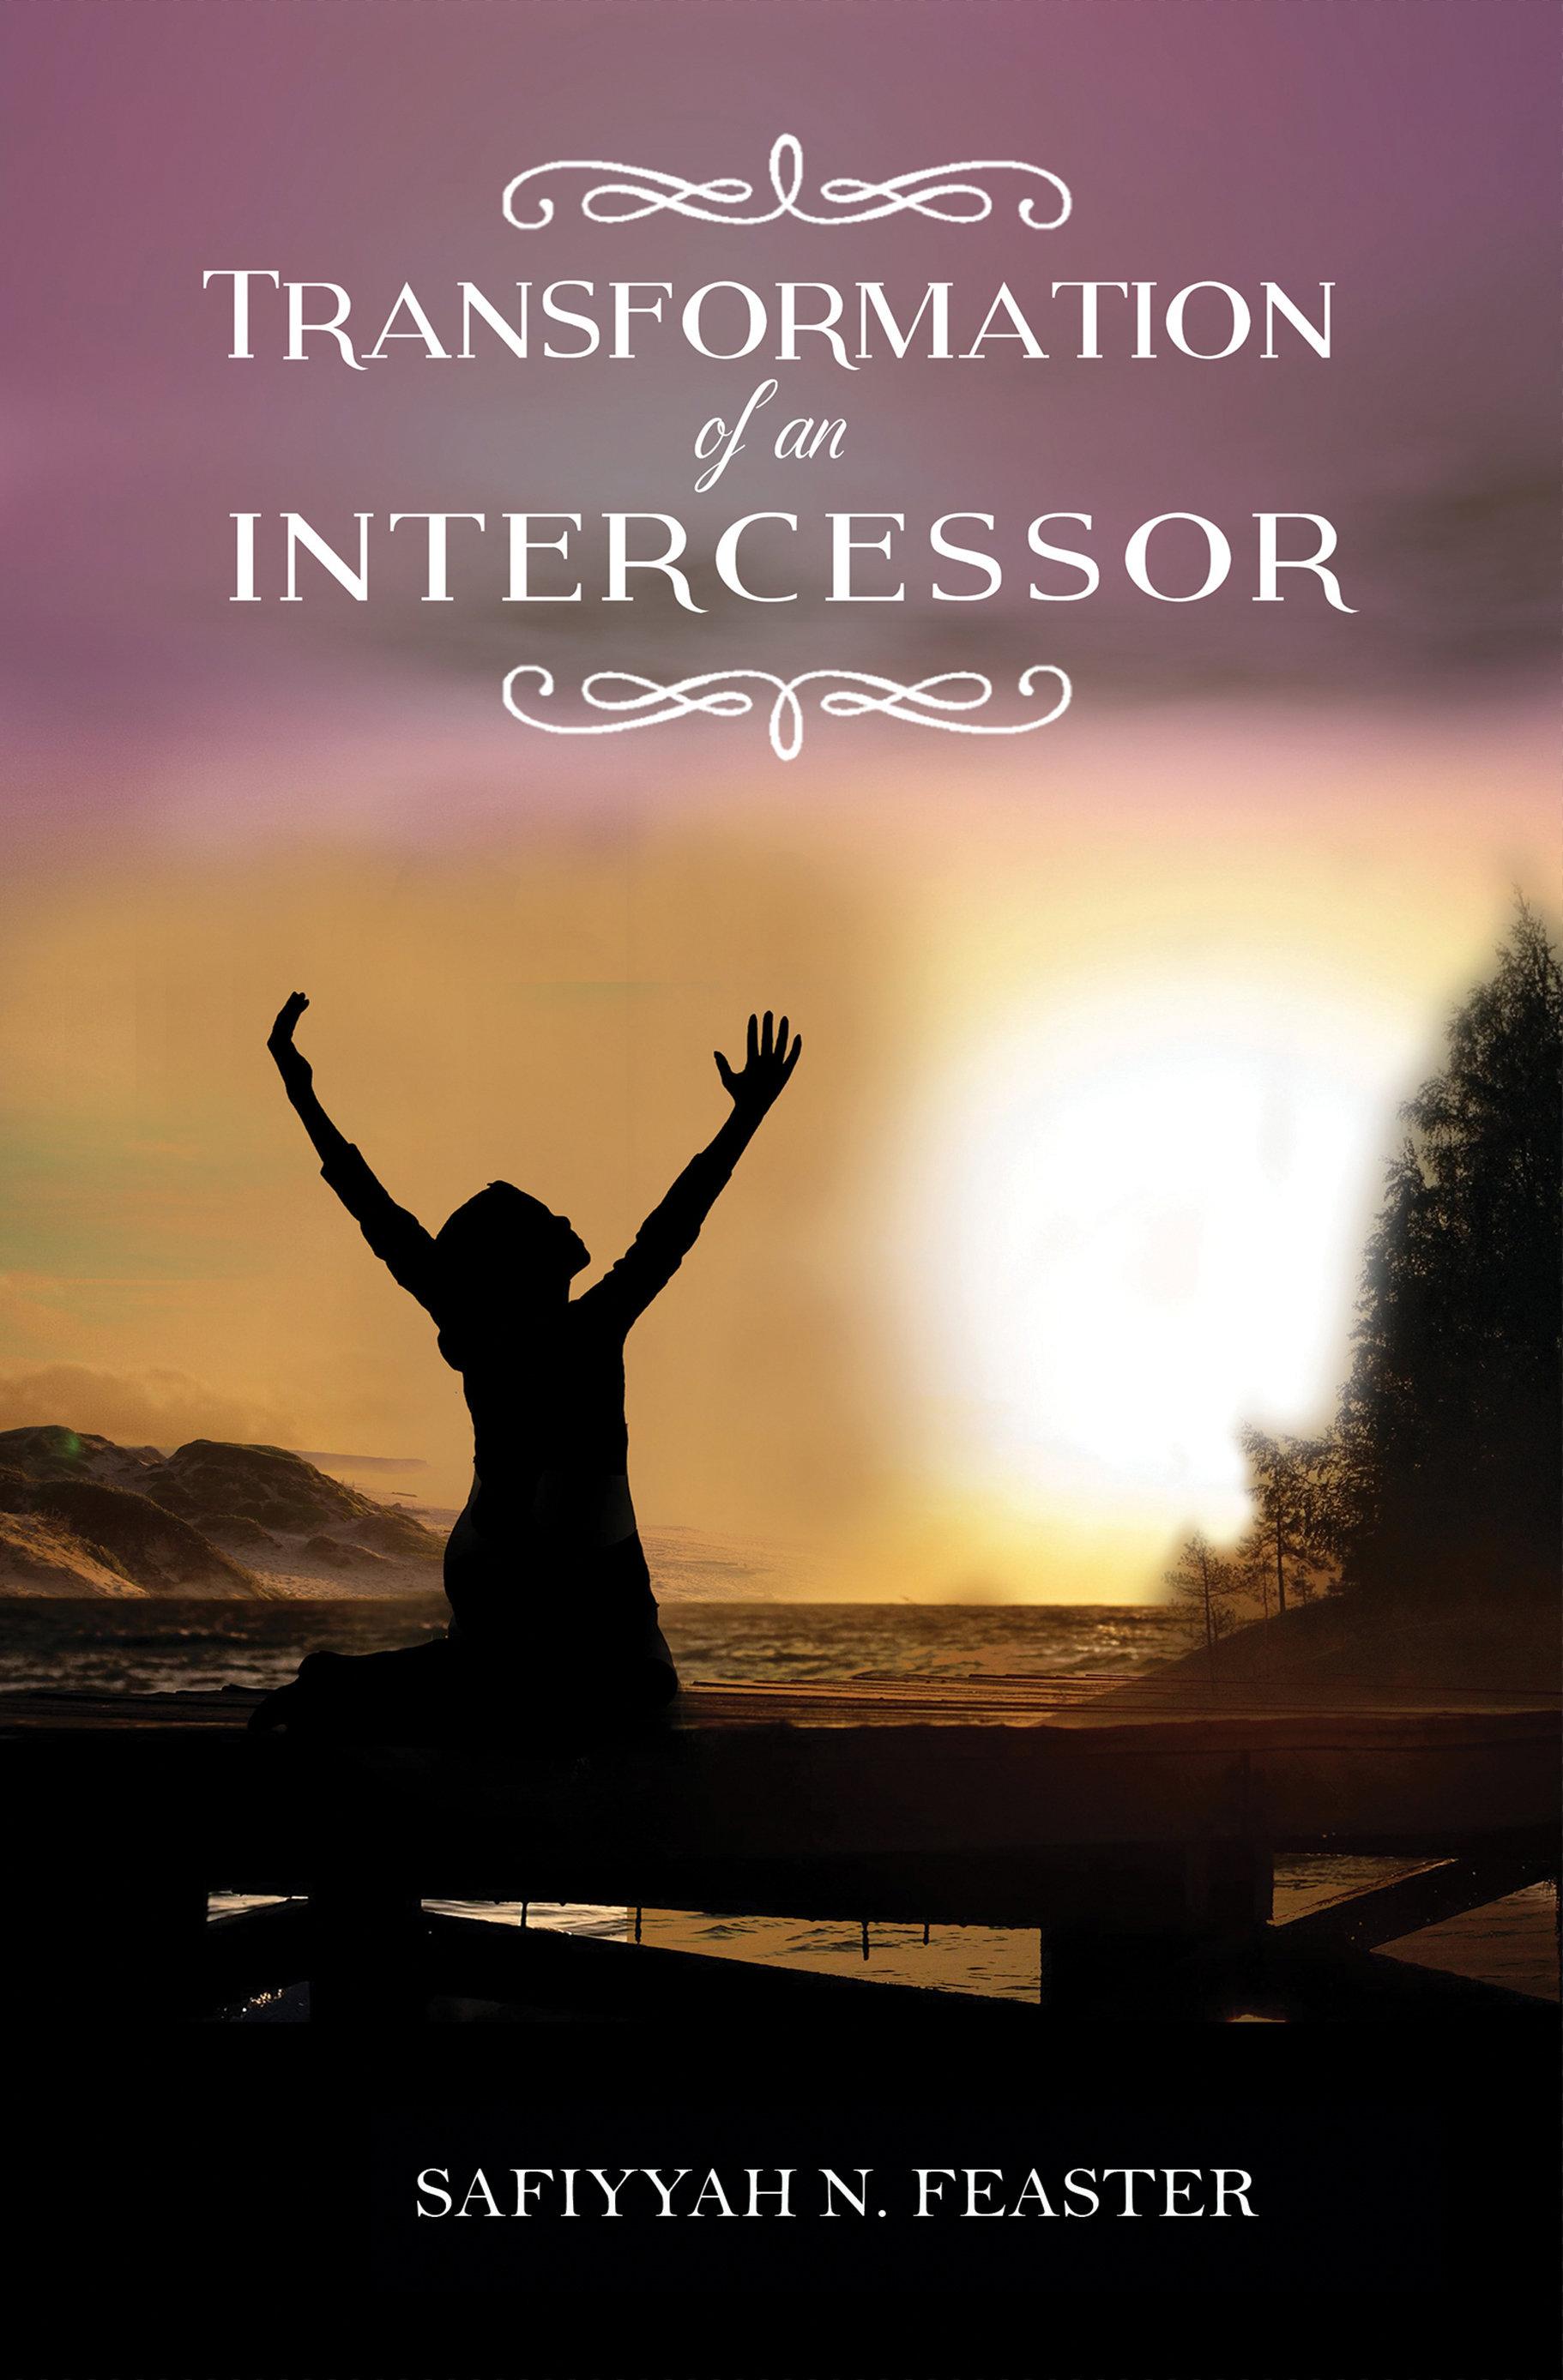 Transformation of an Intercessor by Safiyyah N Feaster 978-1682737606